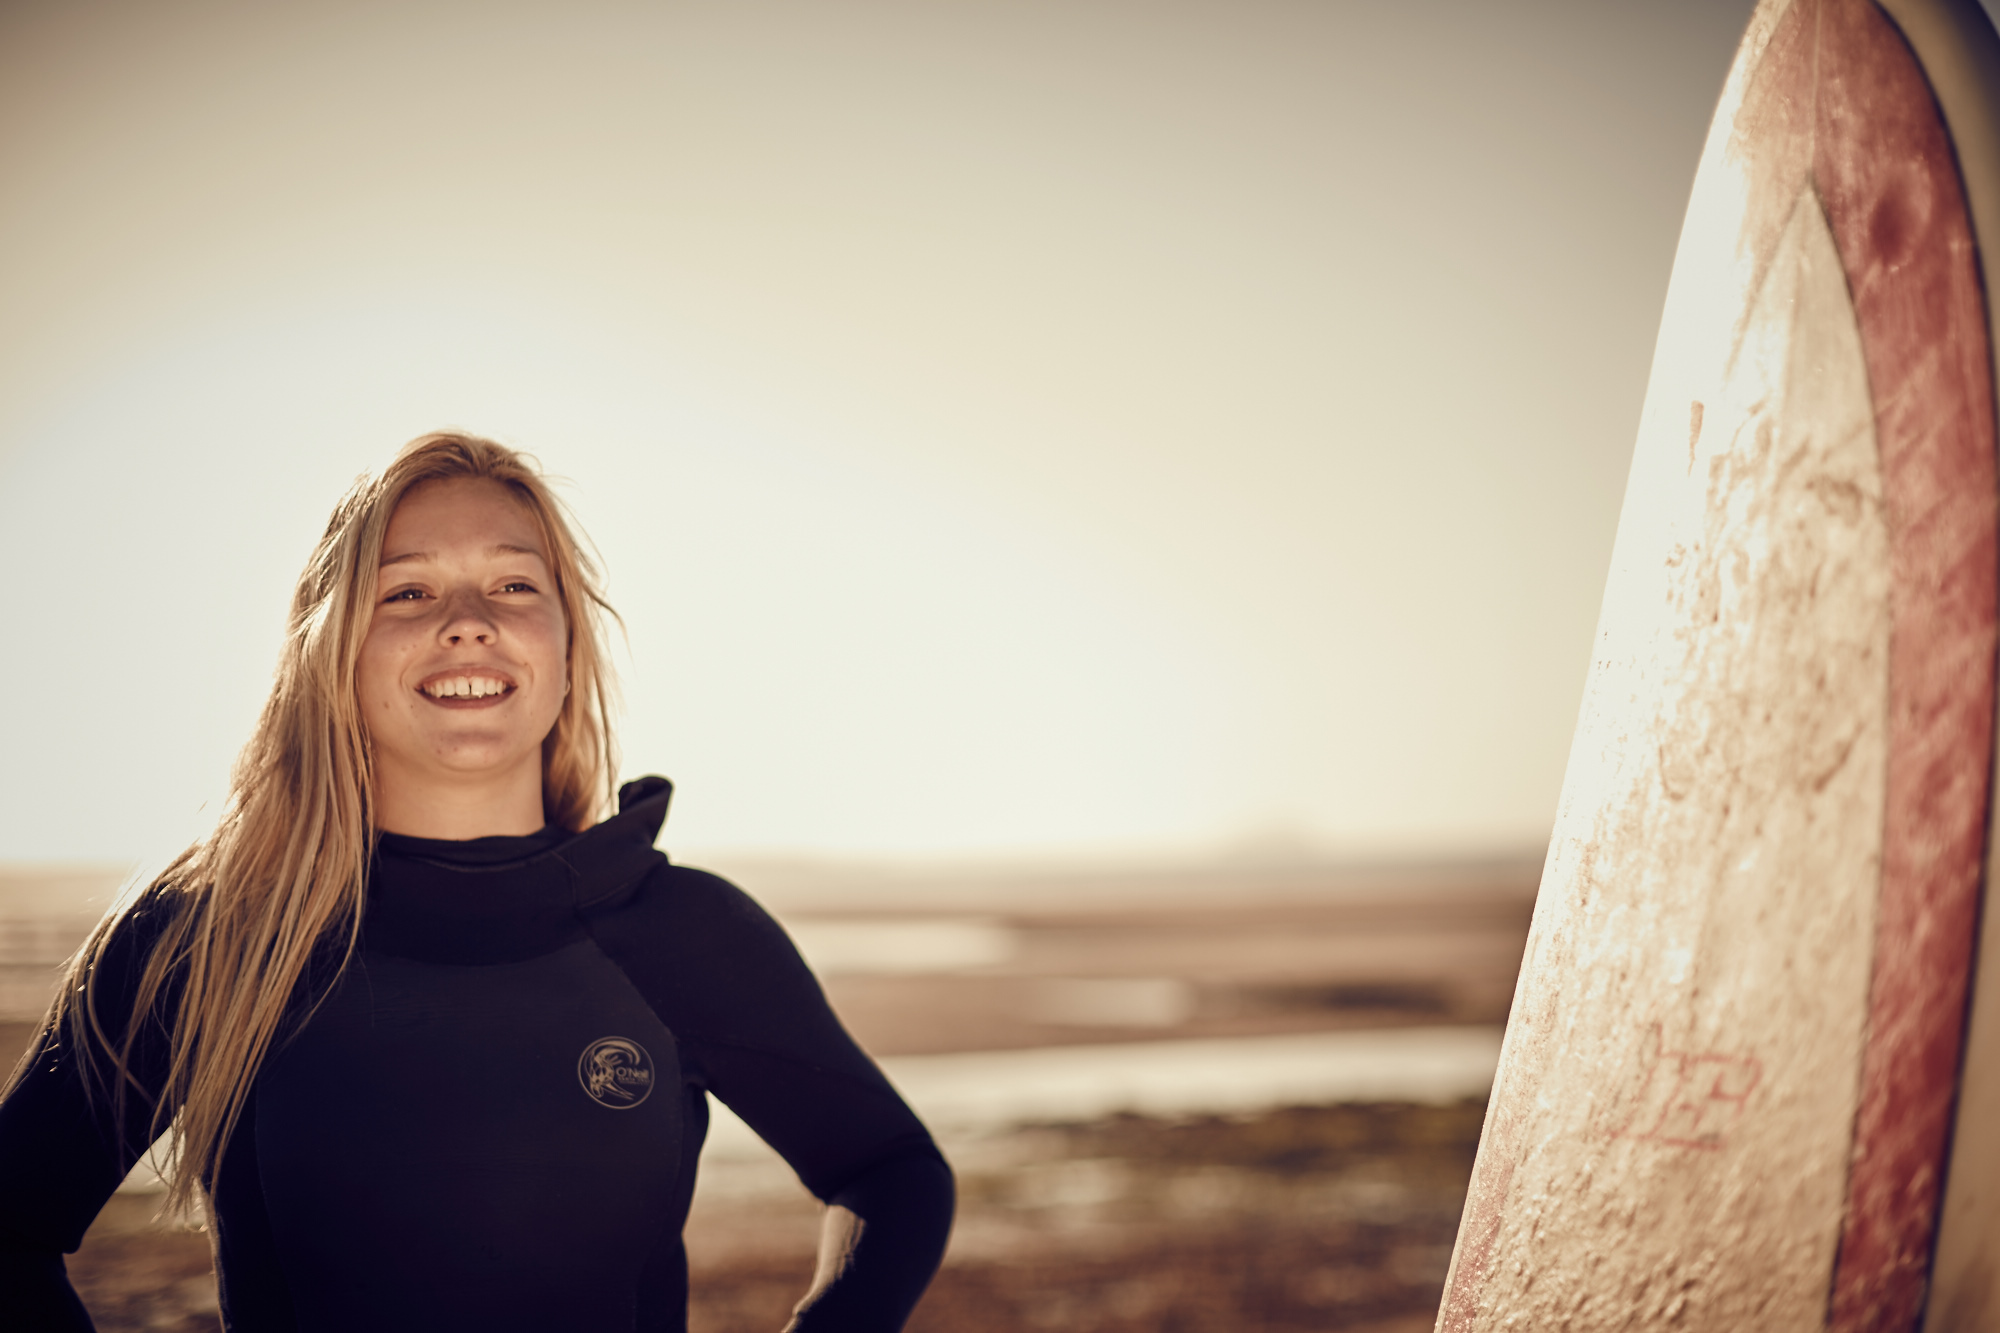 surf lyfestyle 091 1.jpg